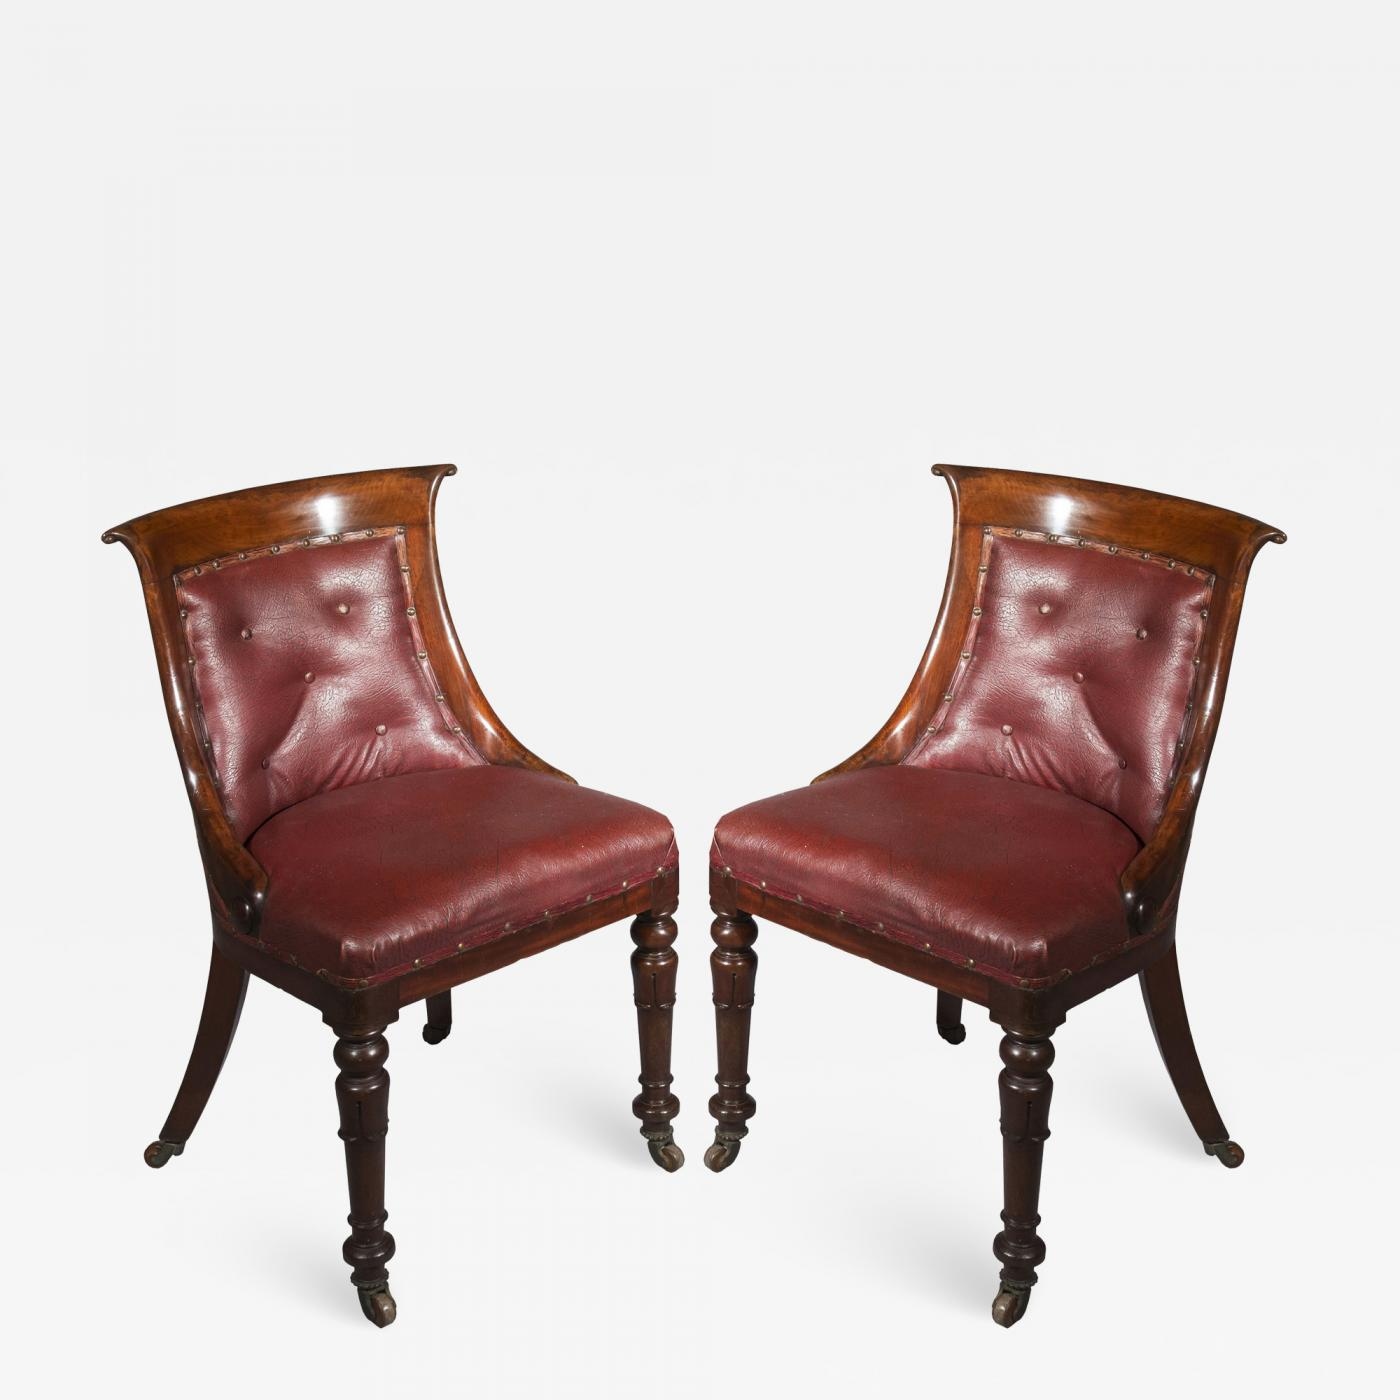 Pleasing Gillows Of Lancaster London Pair Of Regency Gondola Tub Chairs In Old Burgundy Leather Creativecarmelina Interior Chair Design Creativecarmelinacom